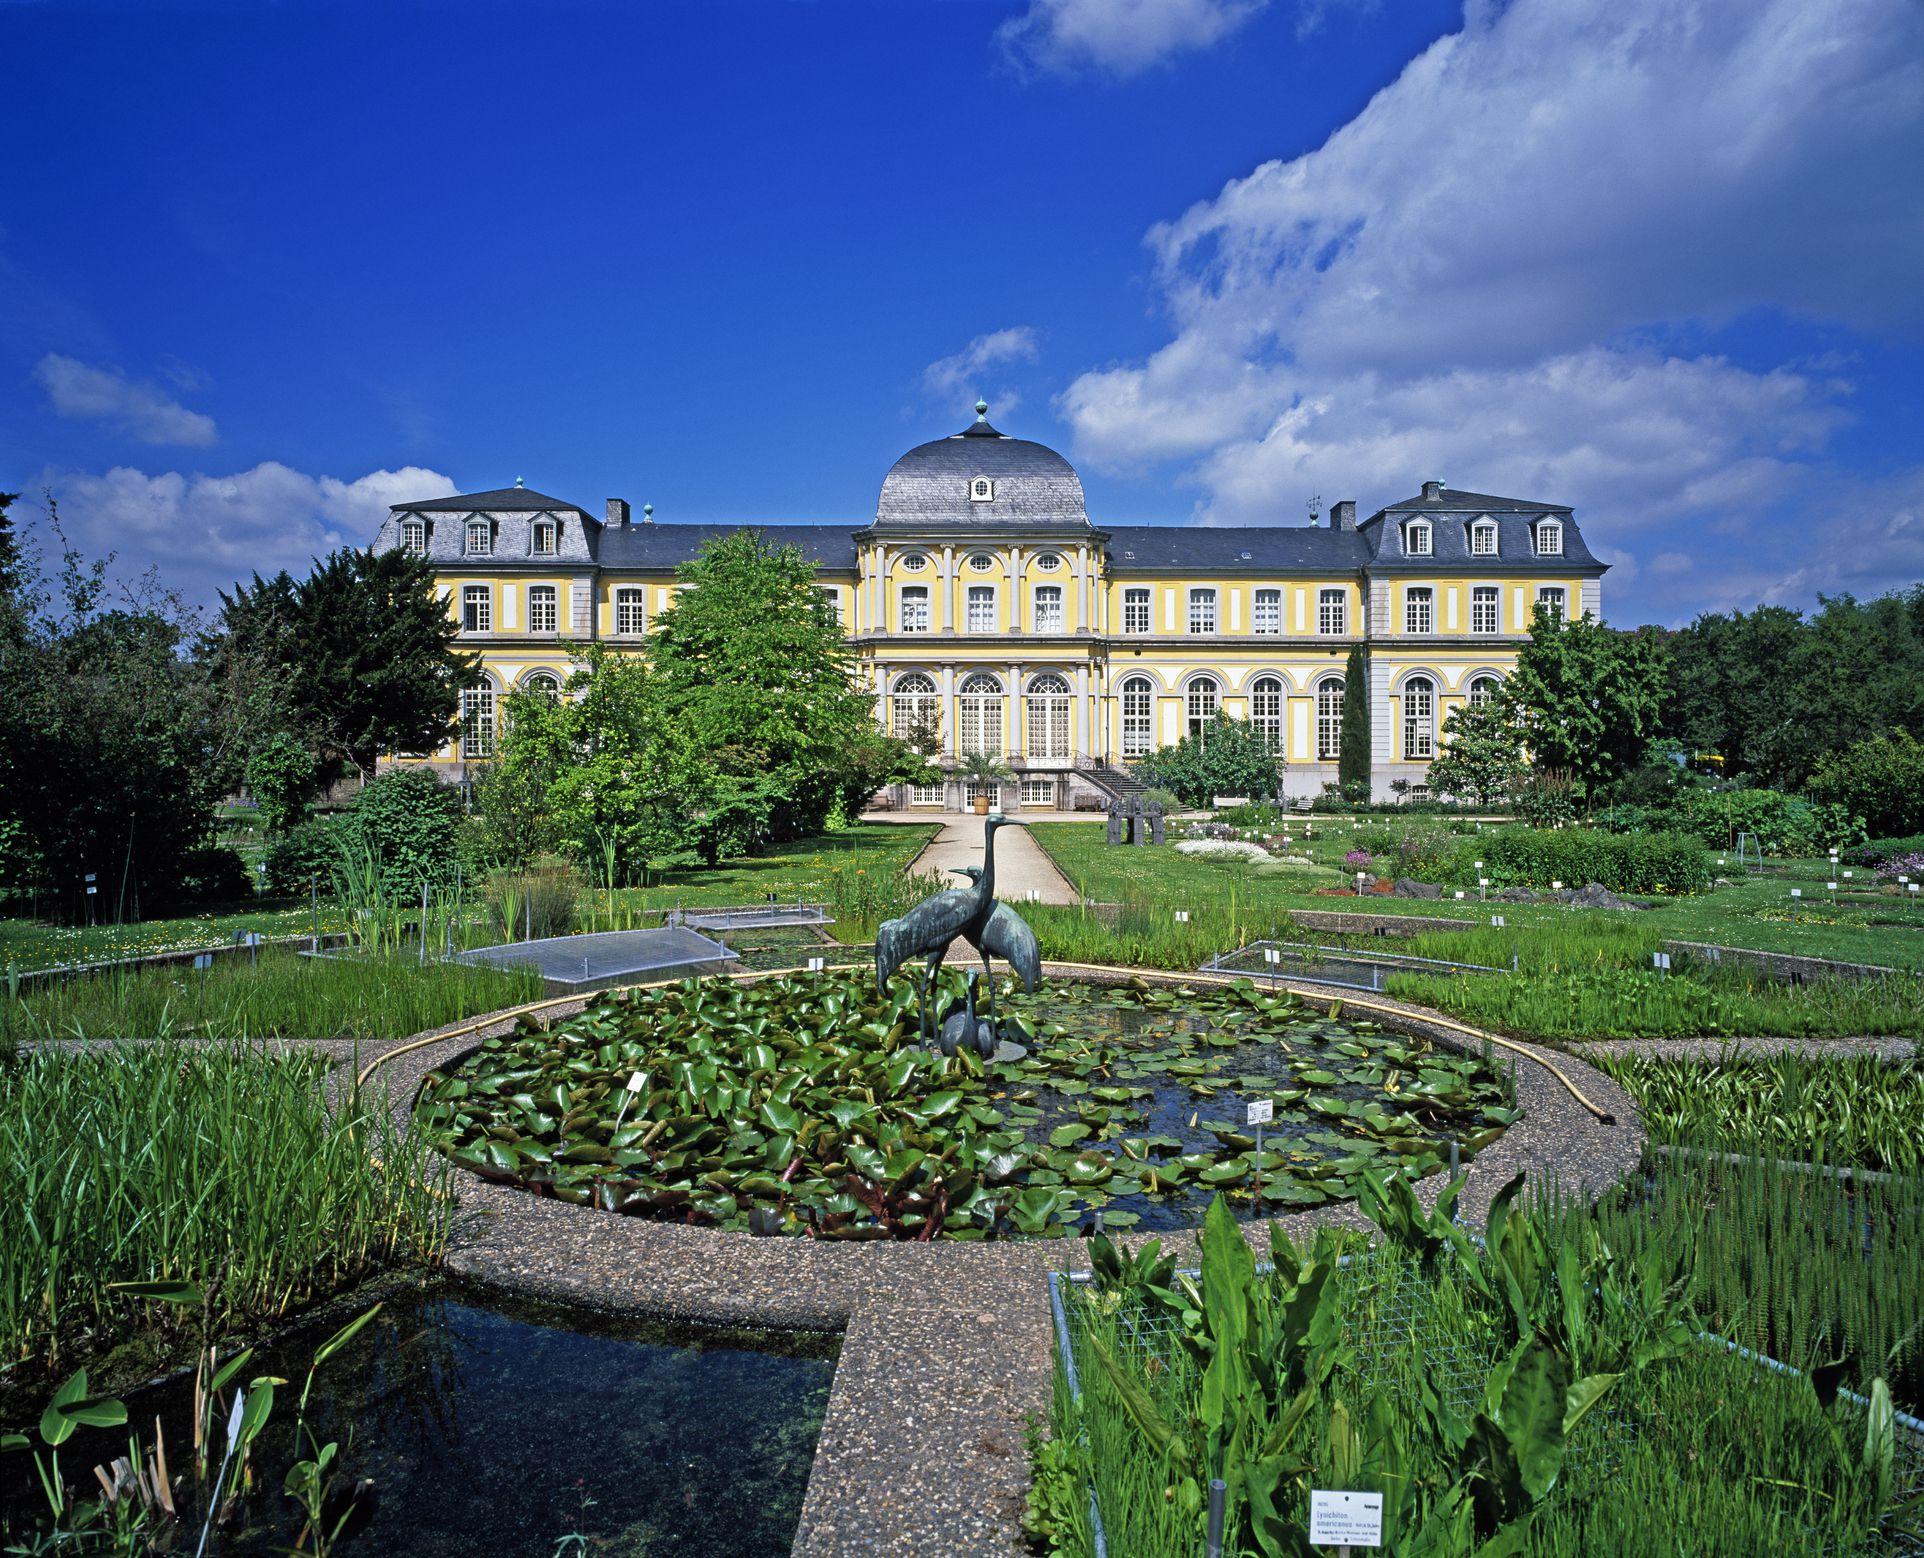 Poppelsdorf Palace and Botanical Garden in Bonn